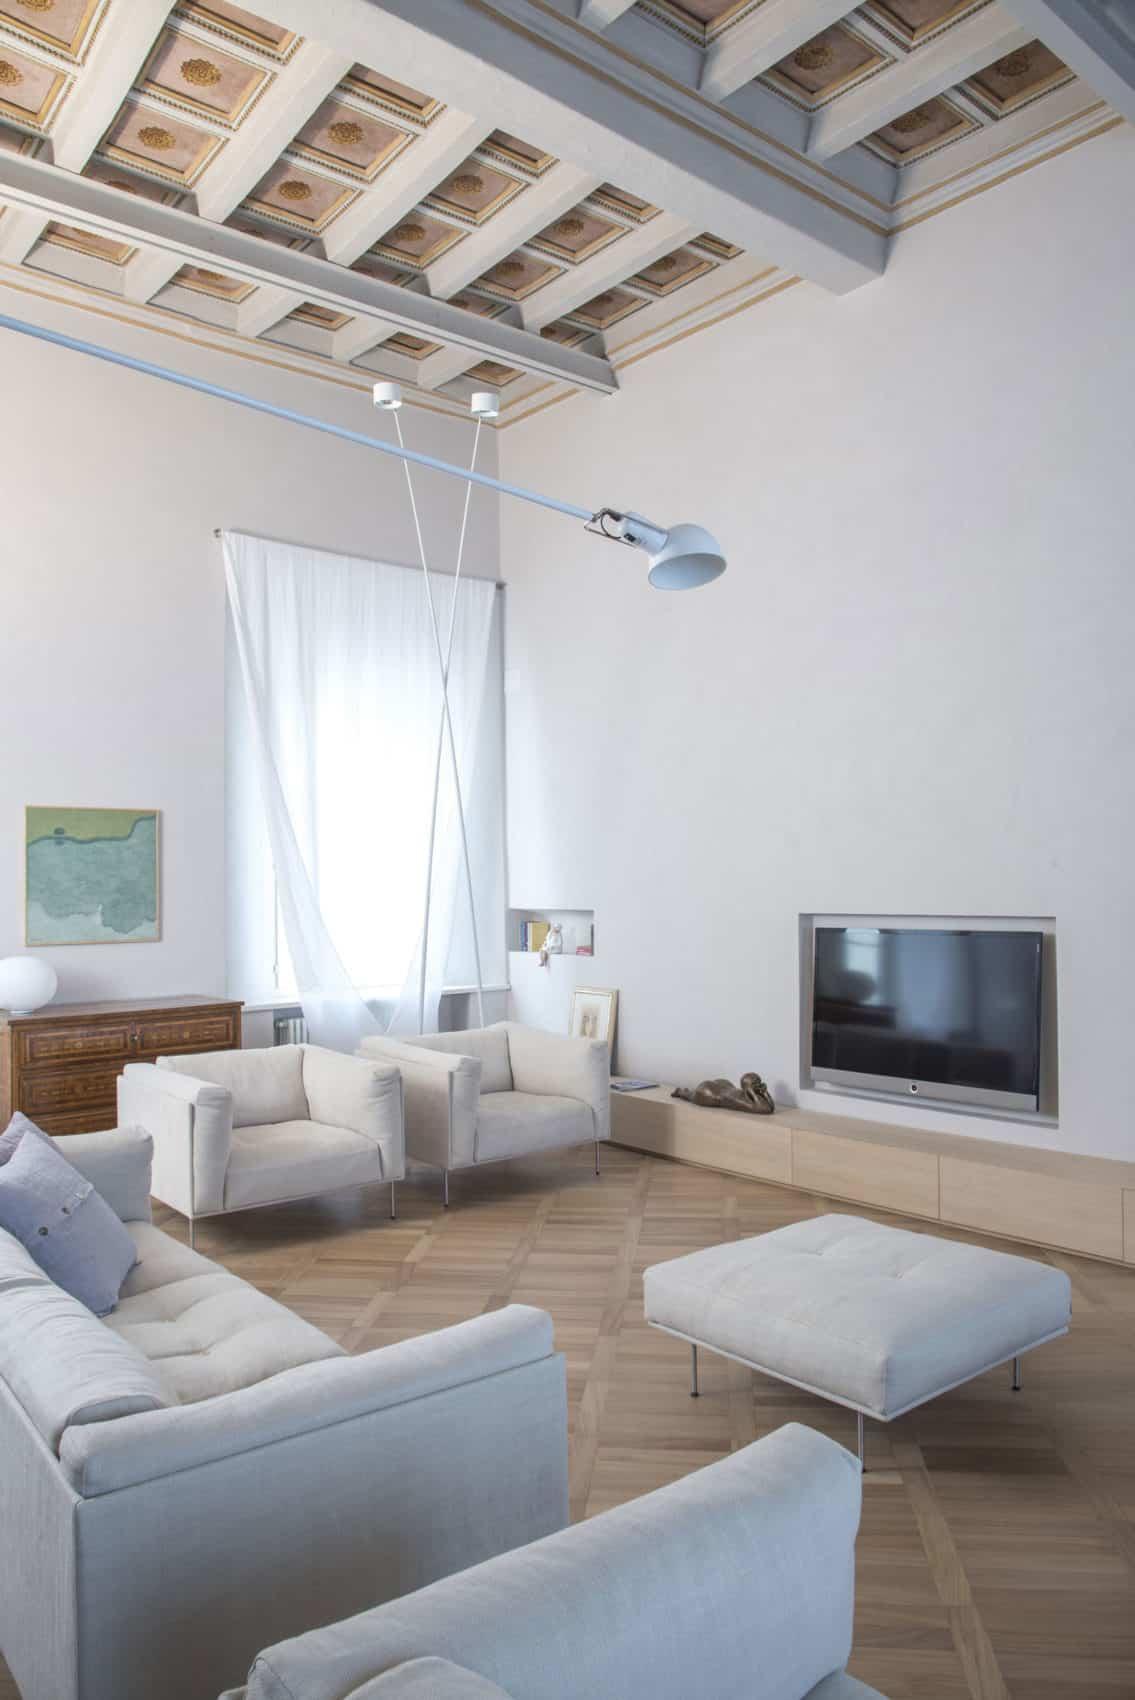 Apartment in Piacenza by Studio Blesi Subitoni (2)